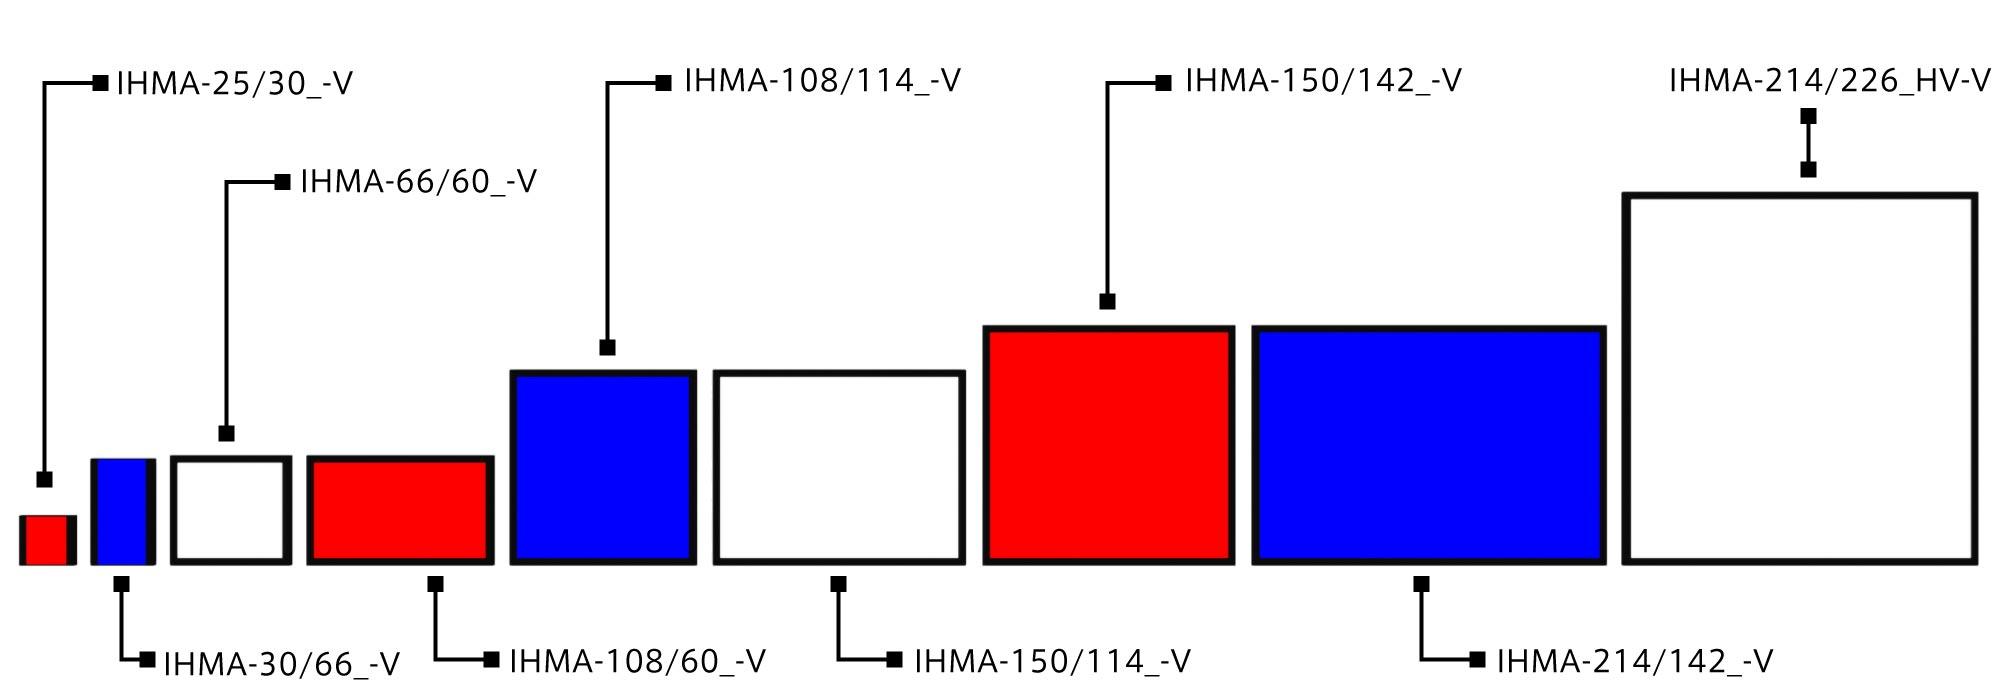 IHMA-V series